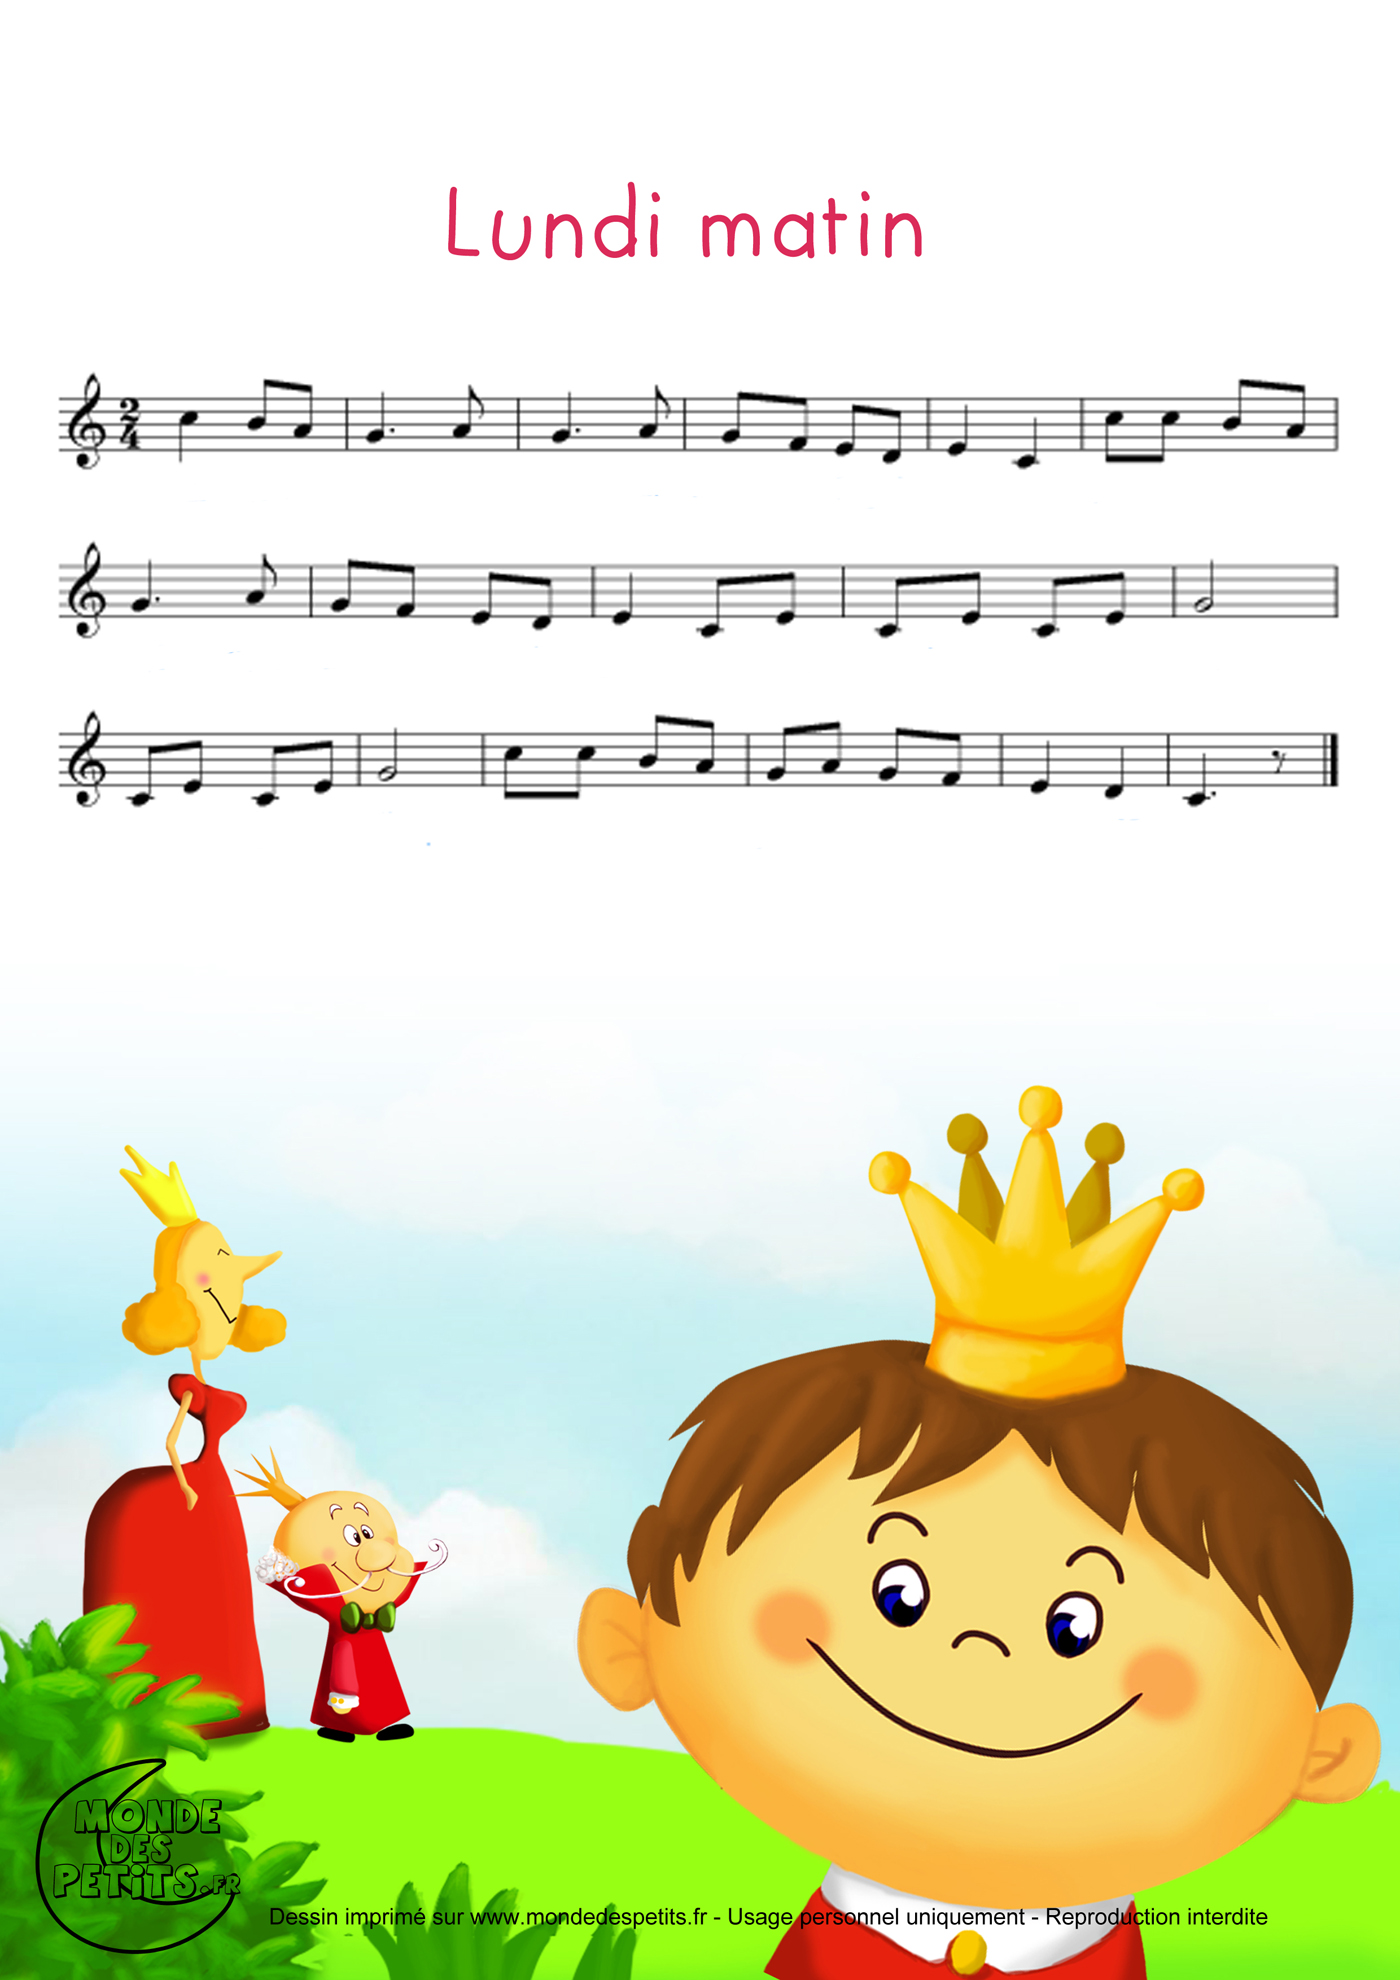 lundi, matin, comptine, chanson, enfant, empereur, prince, femme,